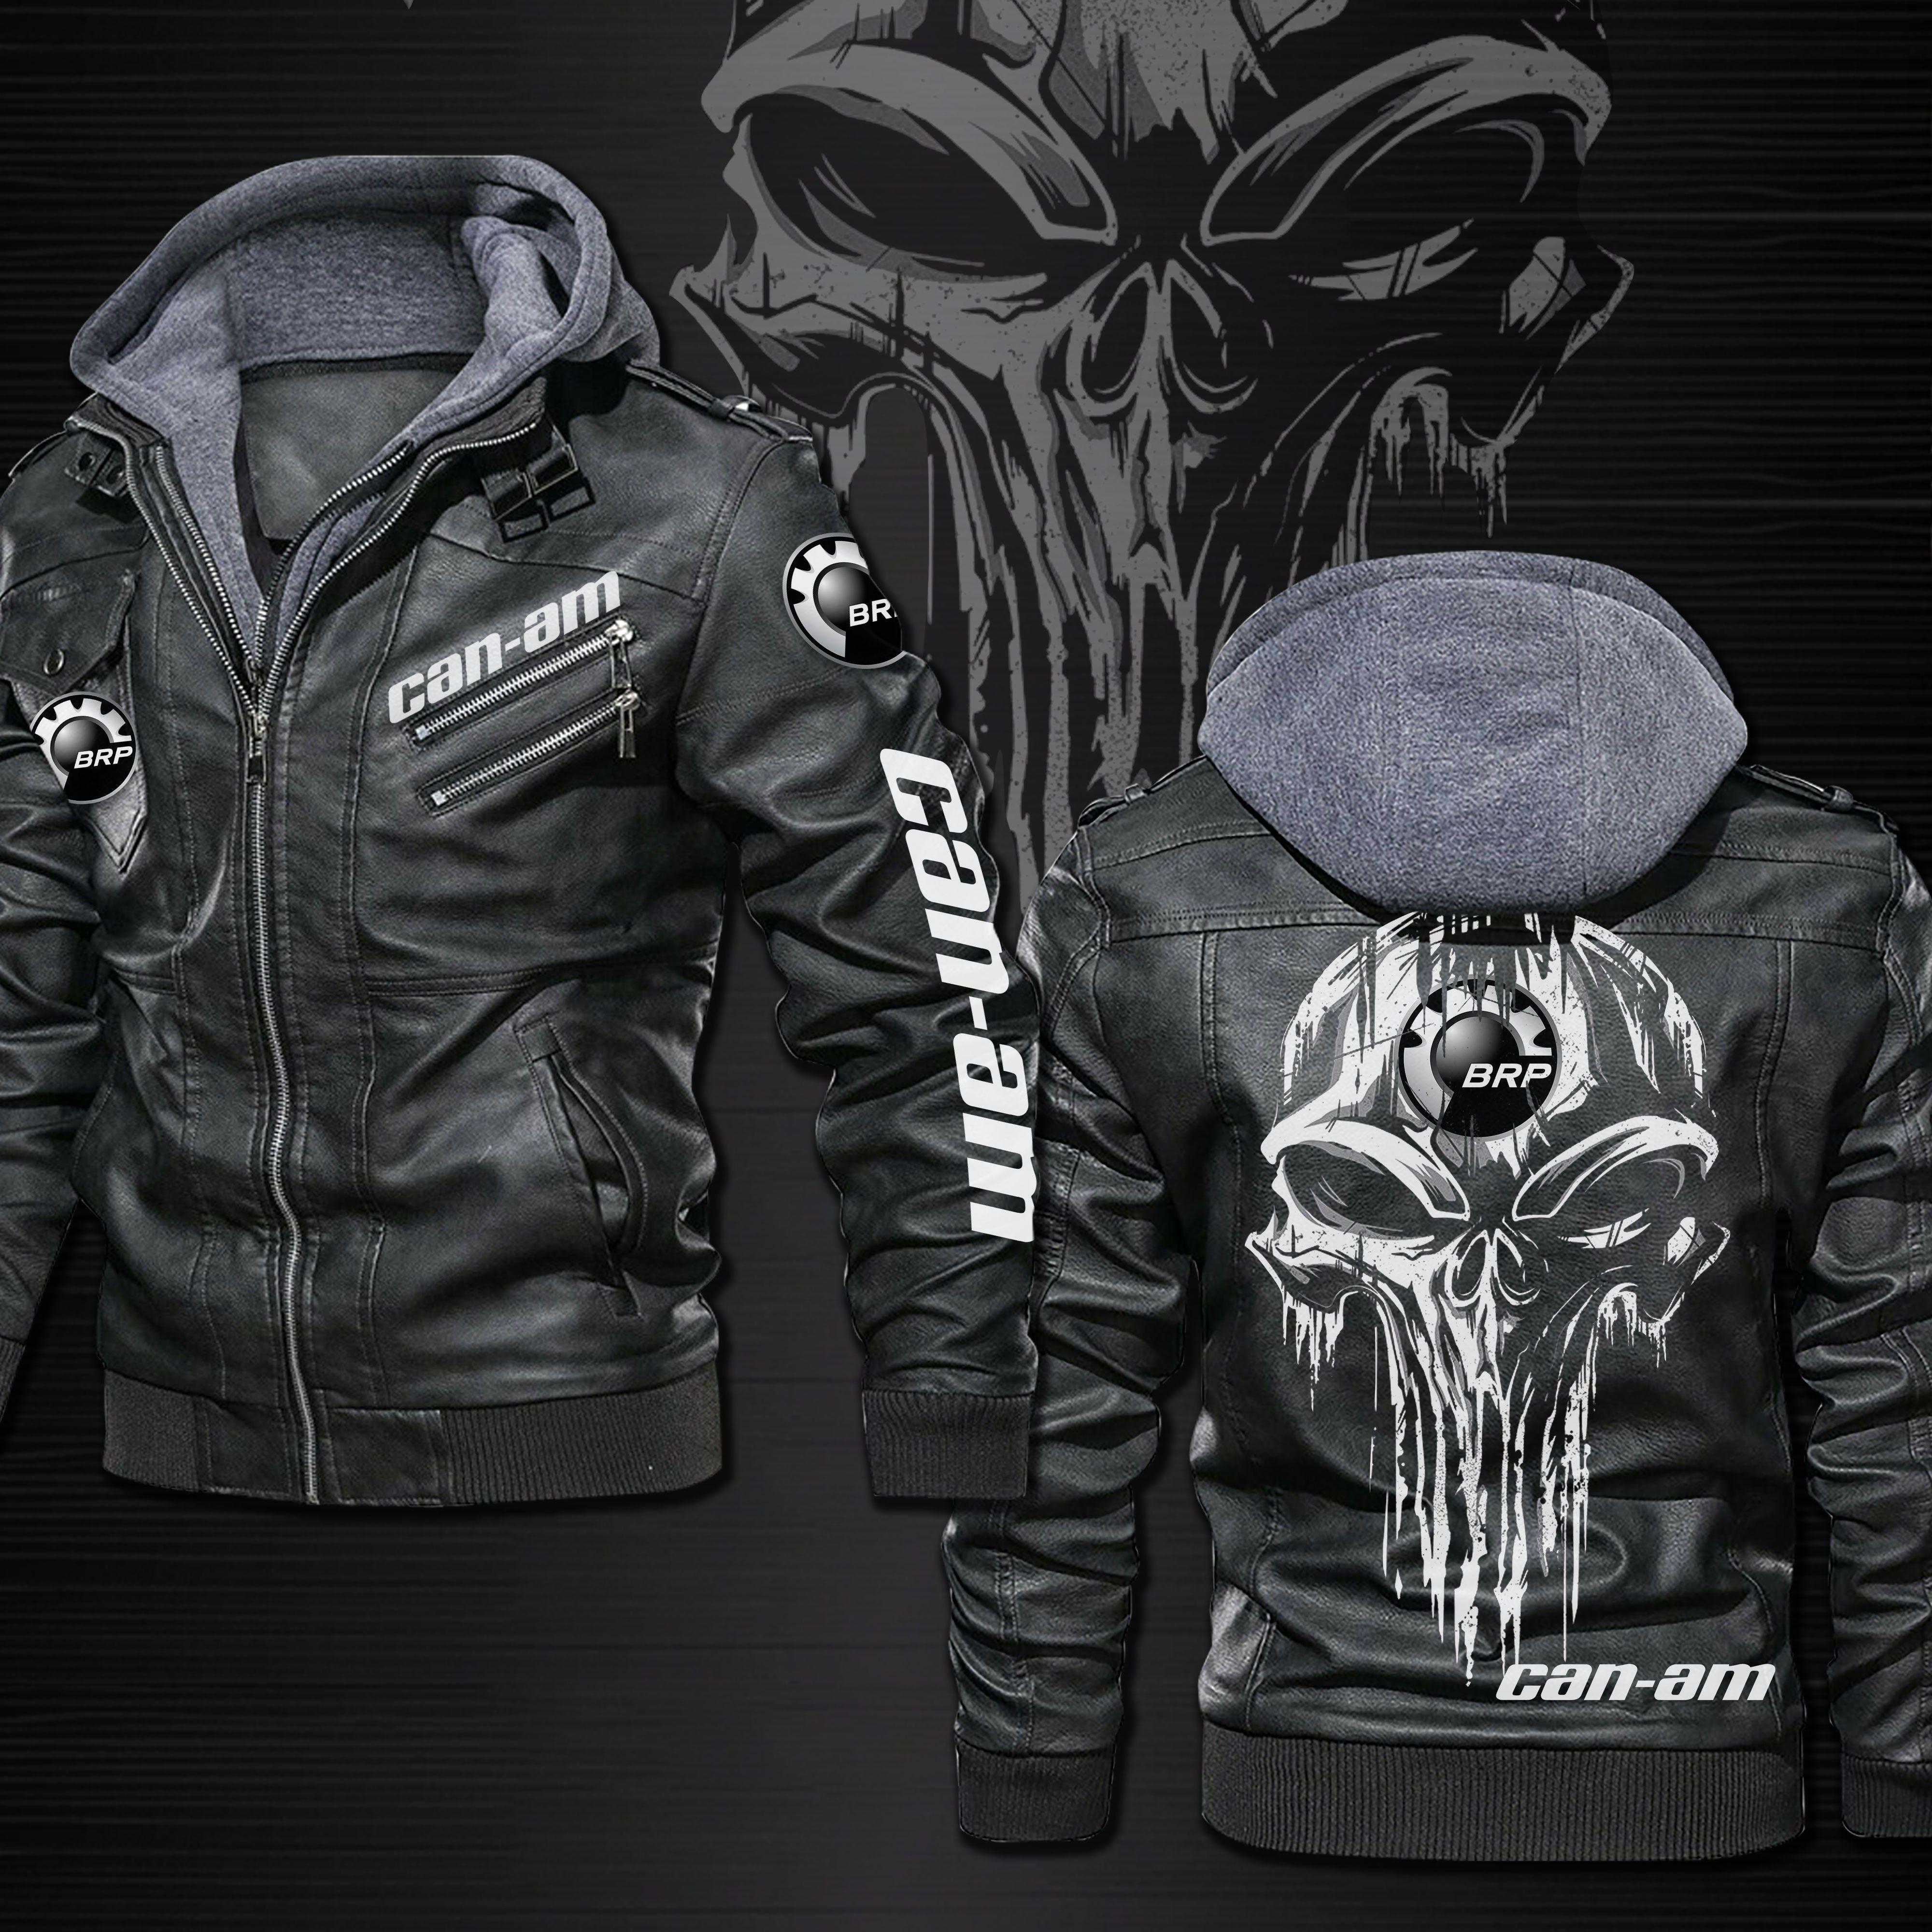 Can Am Punisher Skull Leather Jacket Jackets Leather Jacket Brown Leather Jacket [ 4000 x 4000 Pixel ]